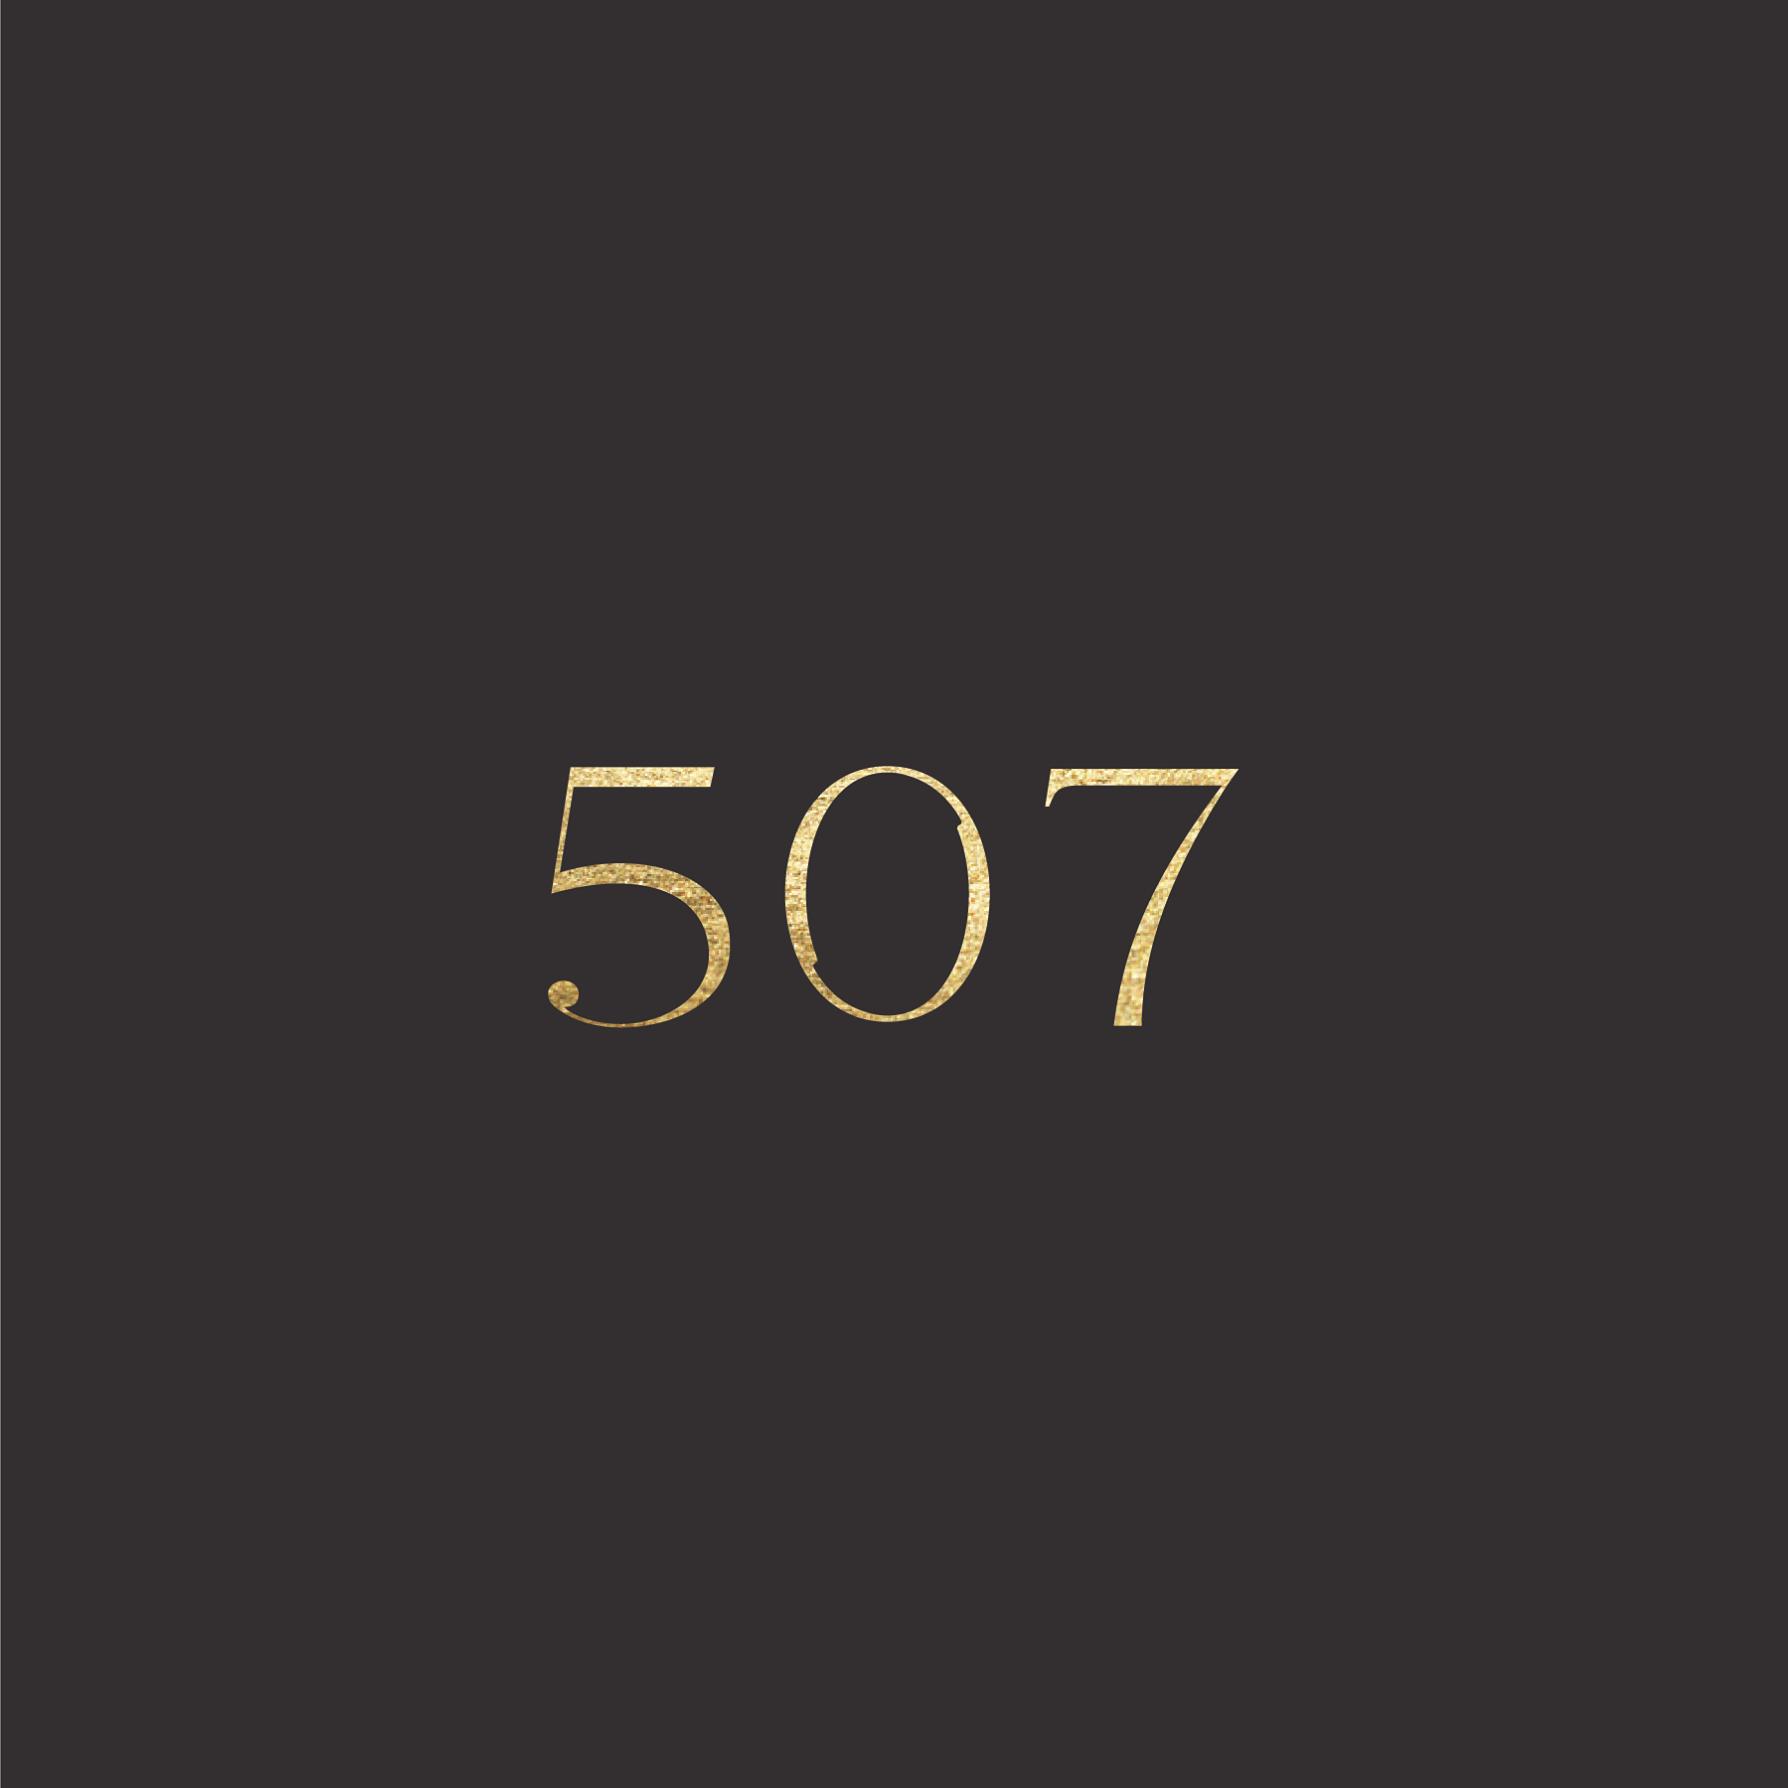 507 Creative Group